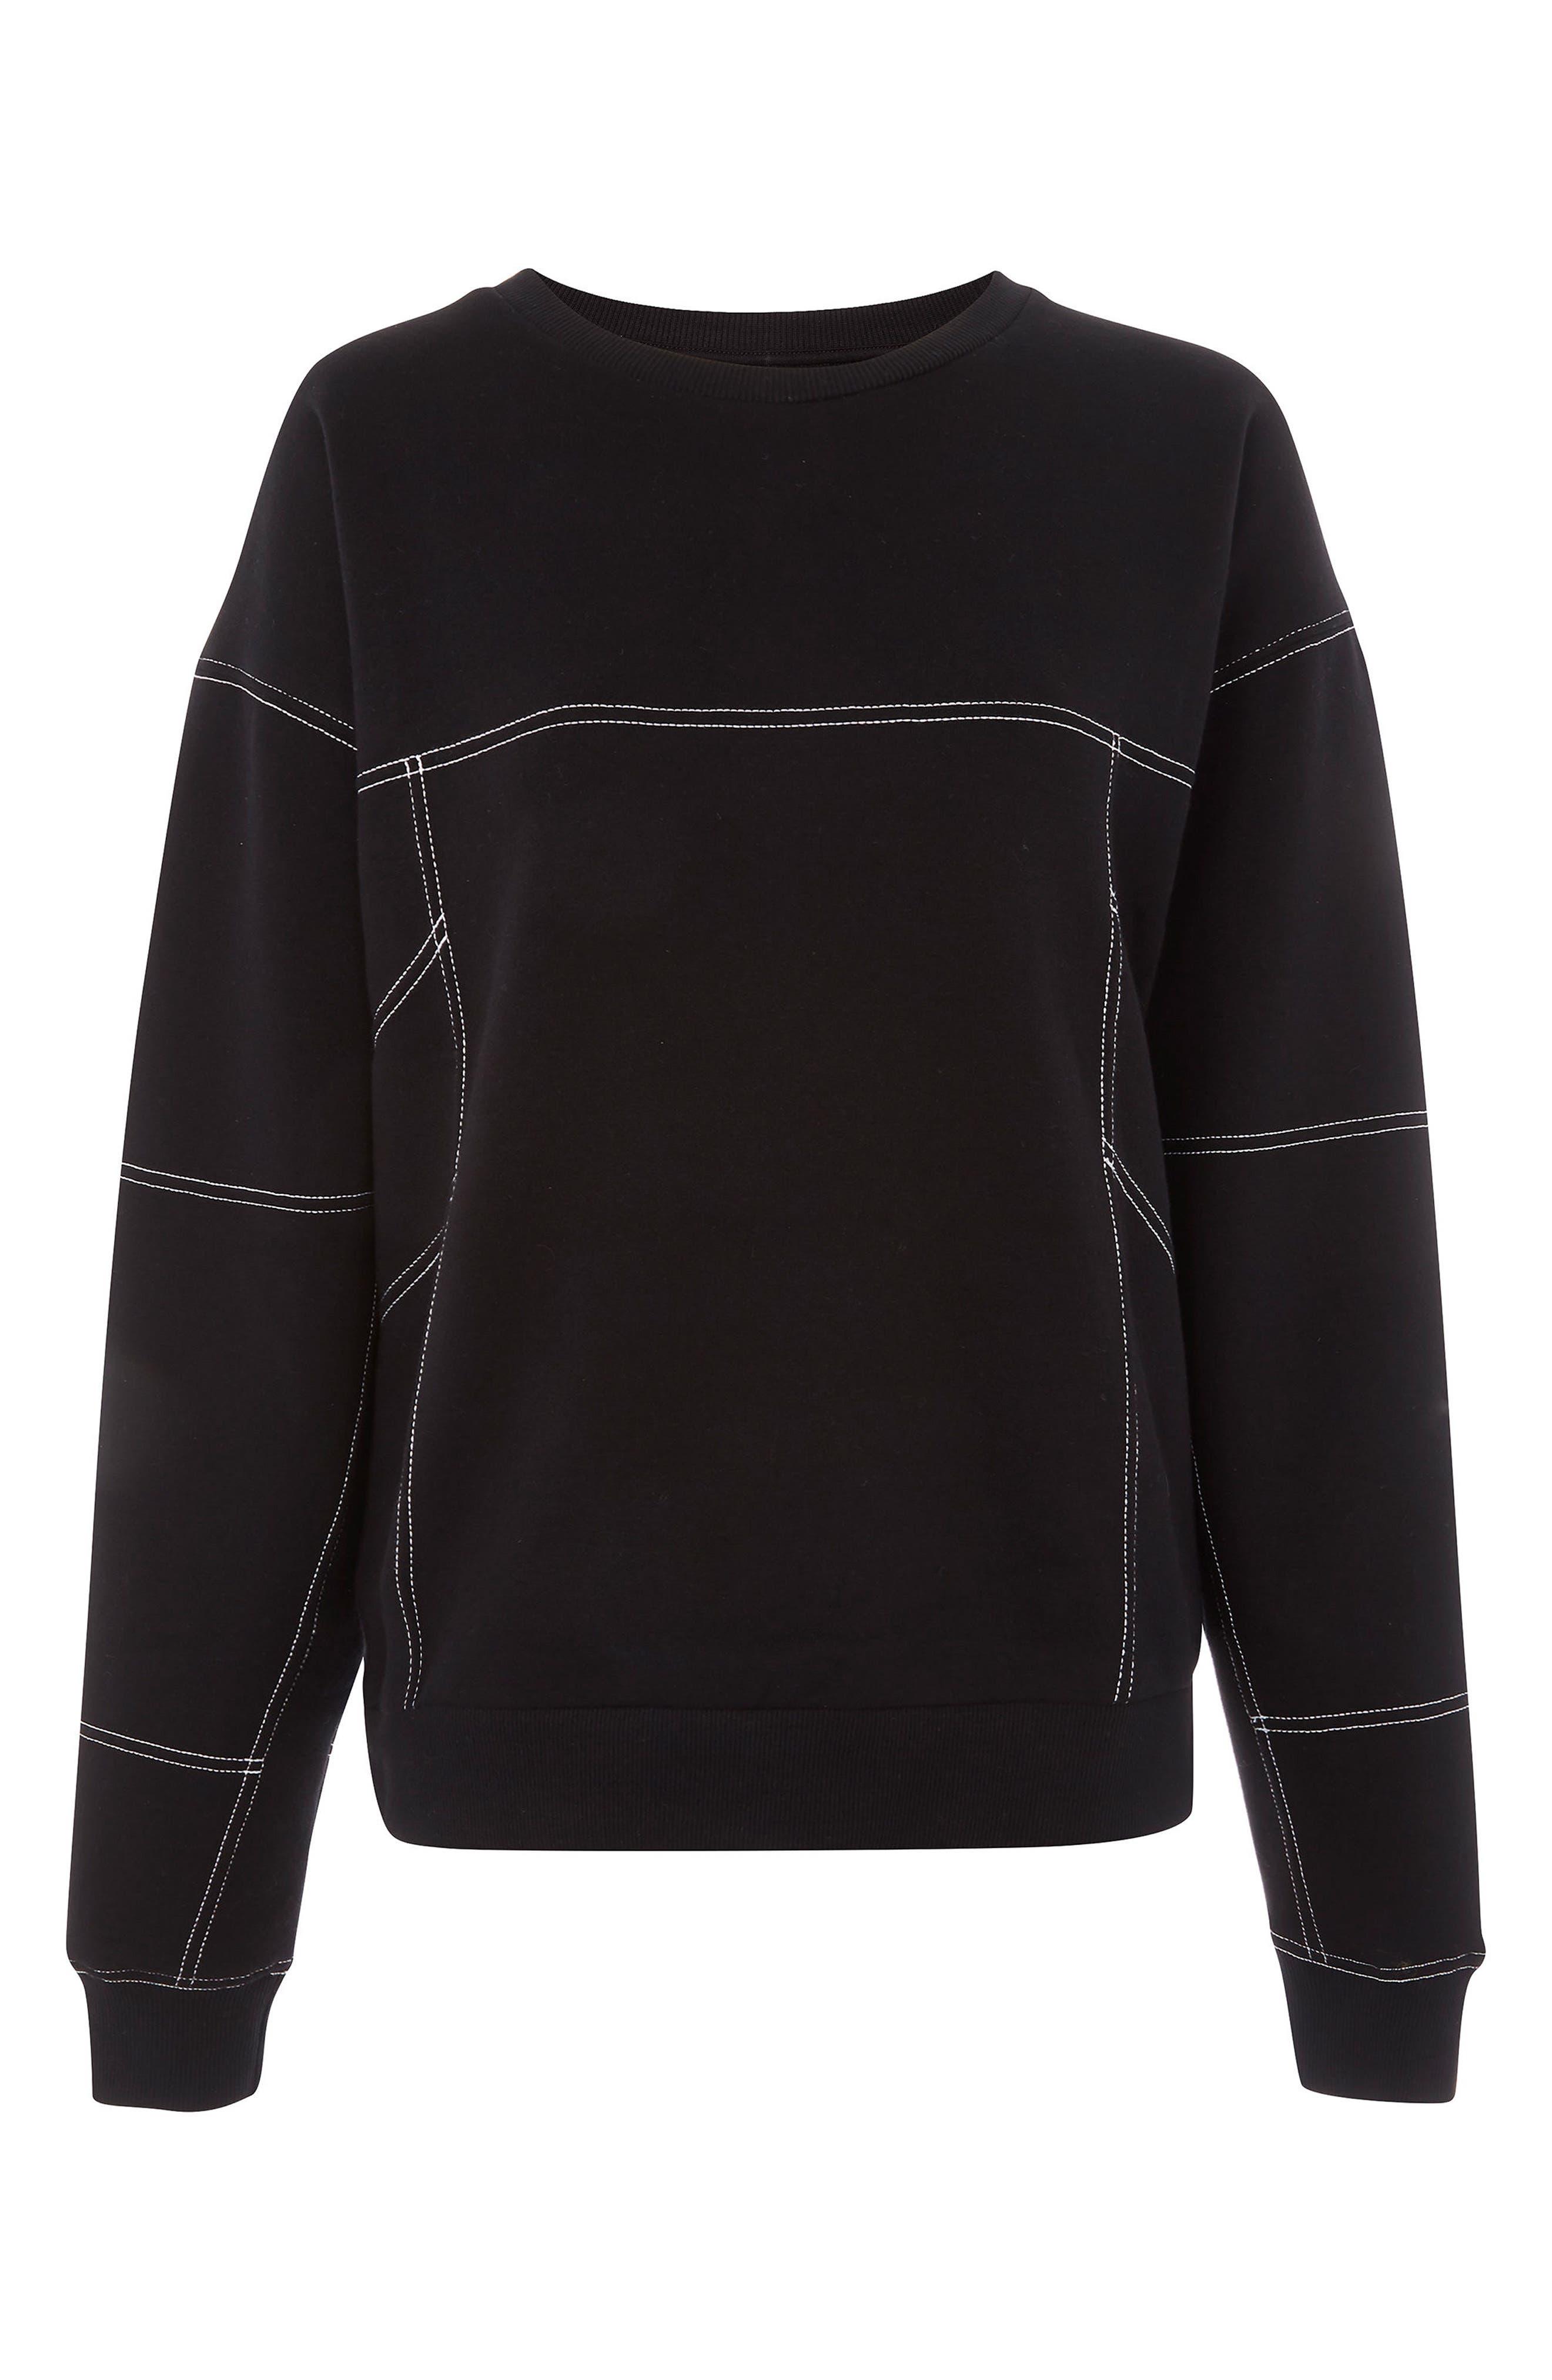 Stab Stitch Detail Sweatshirt,                             Alternate thumbnail 4, color,                             Black